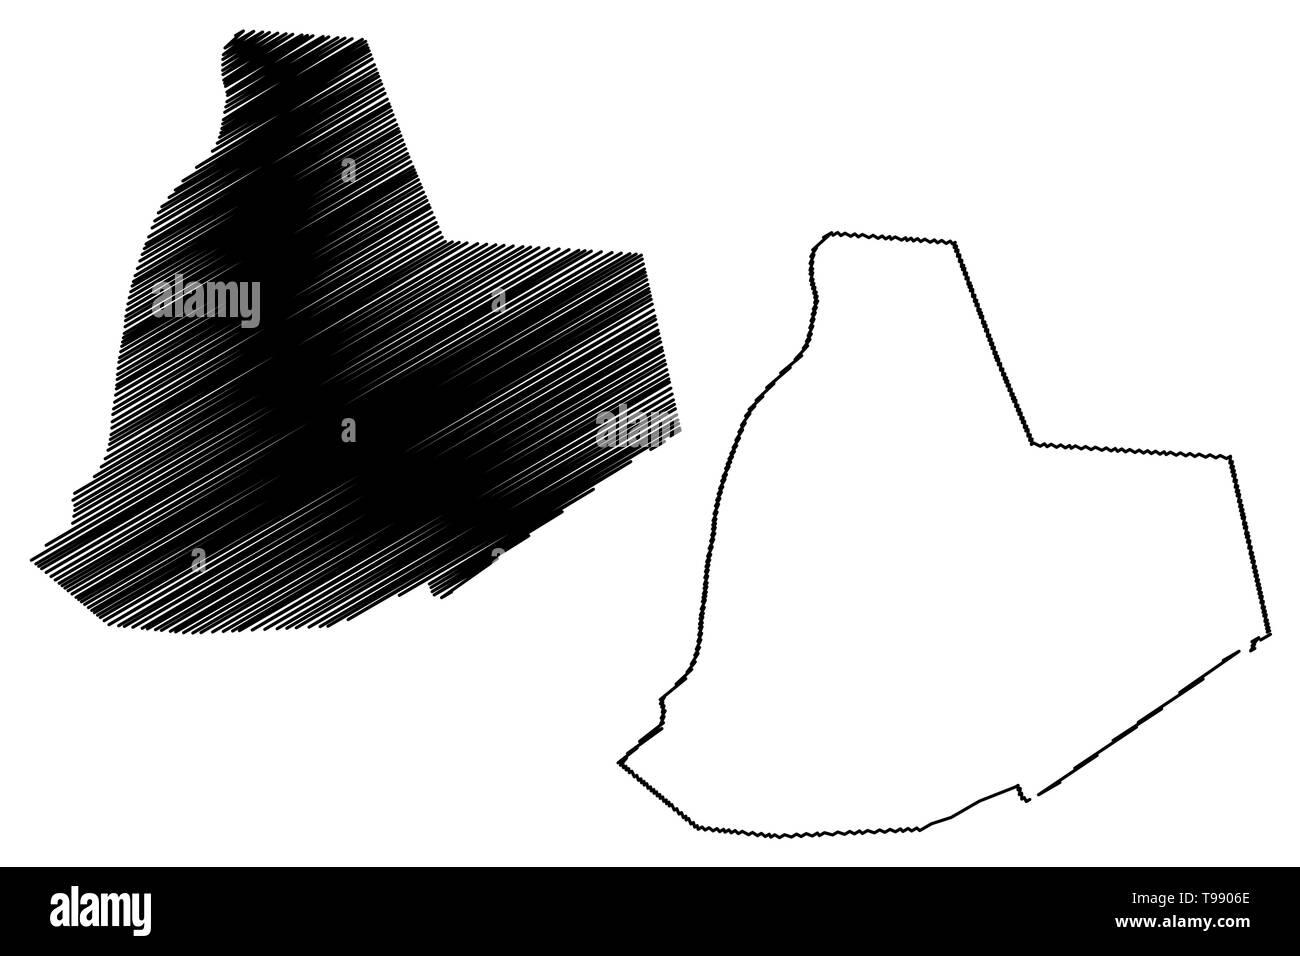 Ouargla Province (Provinces of Algeria, Peoples Democratic Republic of Algeria) map vector illustration, scribble sketch Warqla map - Stock Image